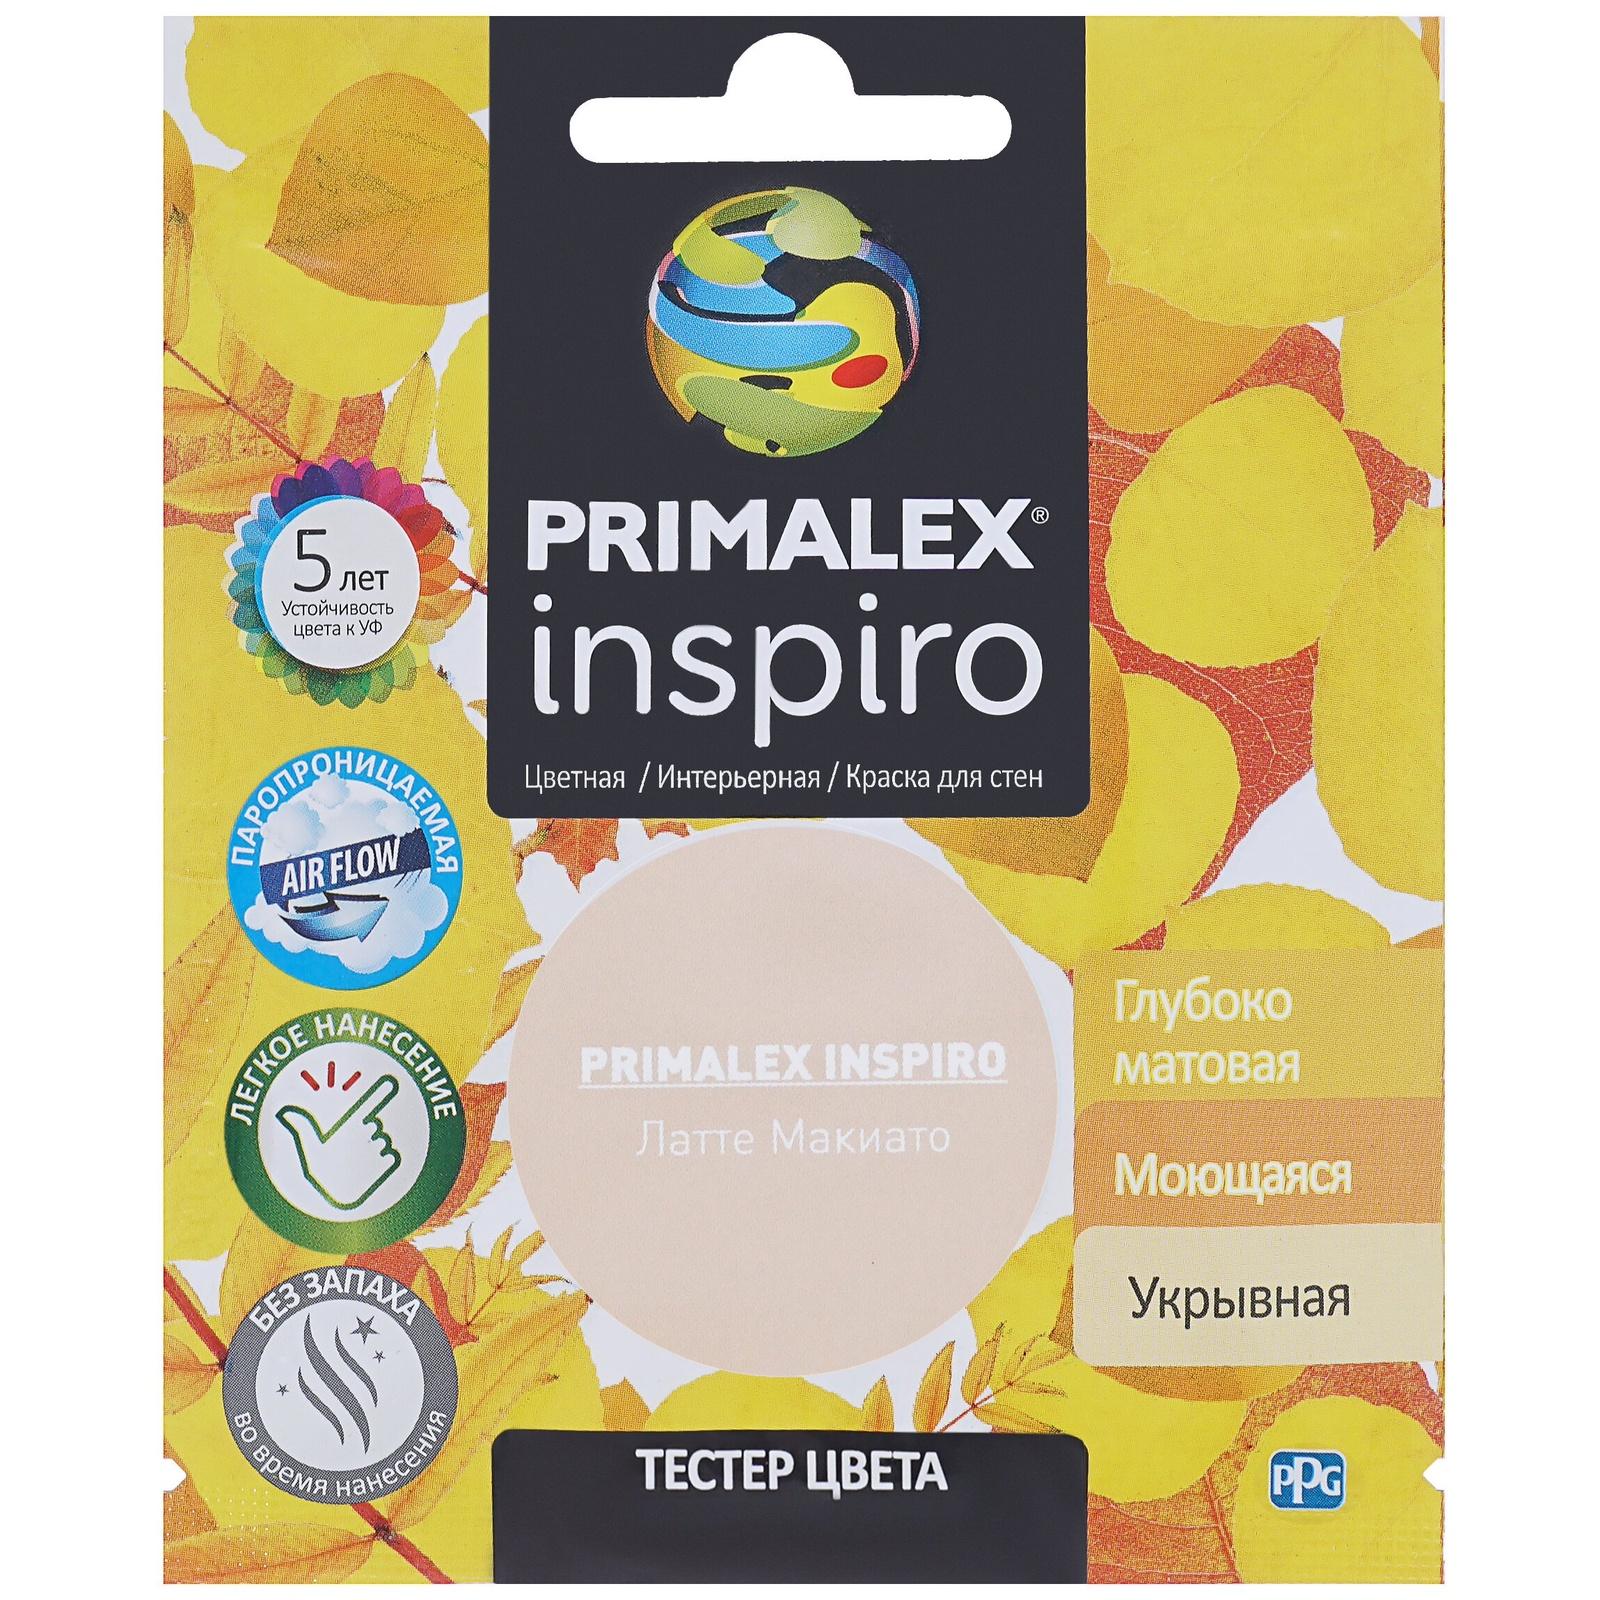 Краска PPG Primalex Inspiro Латте Макиато 40мл краска ppg primalex inspiro красный мак 40мл pmx i47